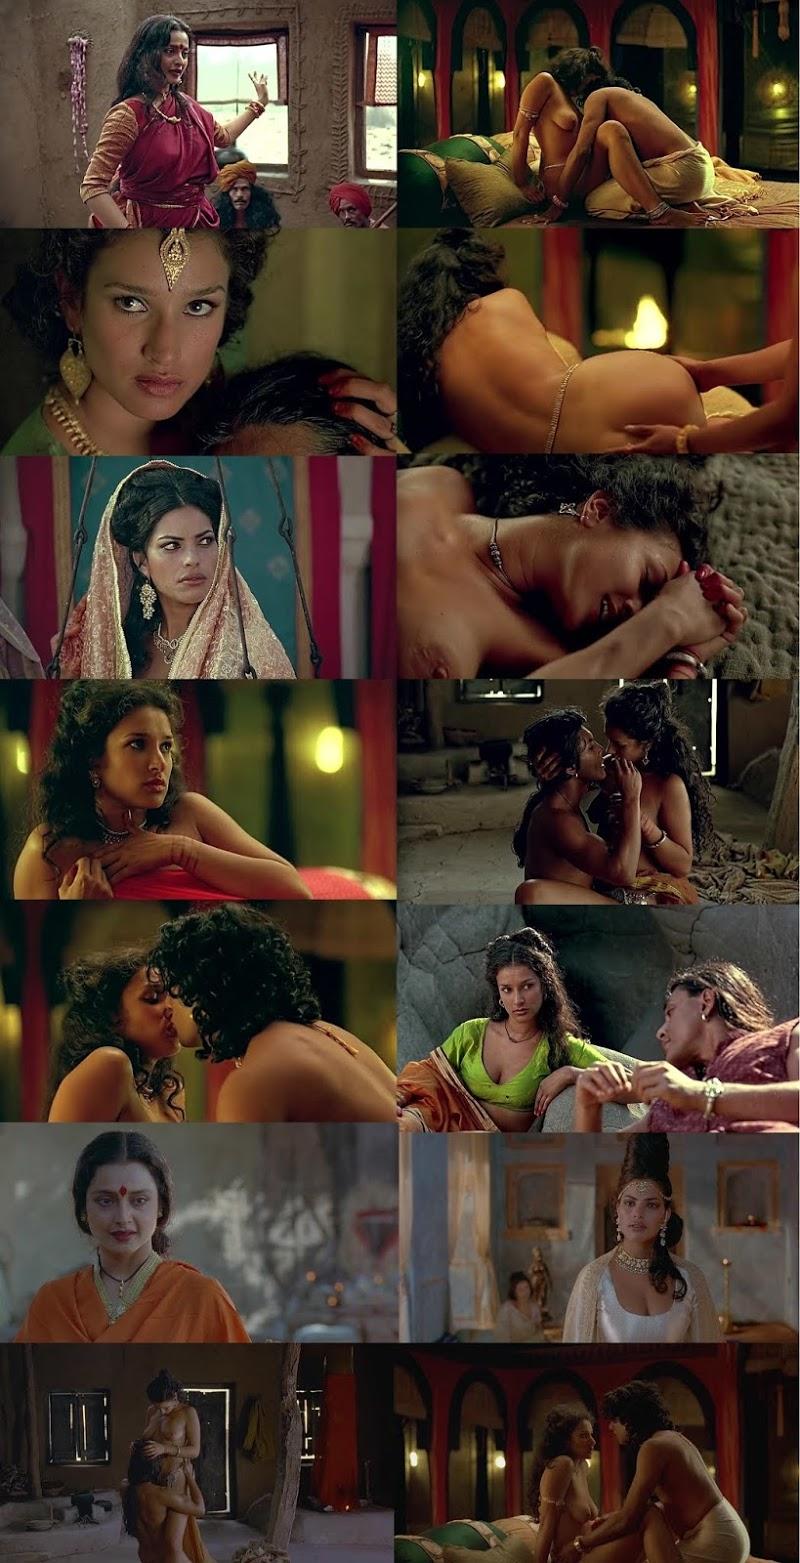 Kama Sutra: A Tale of Love 1996 Full Movie Online Watch